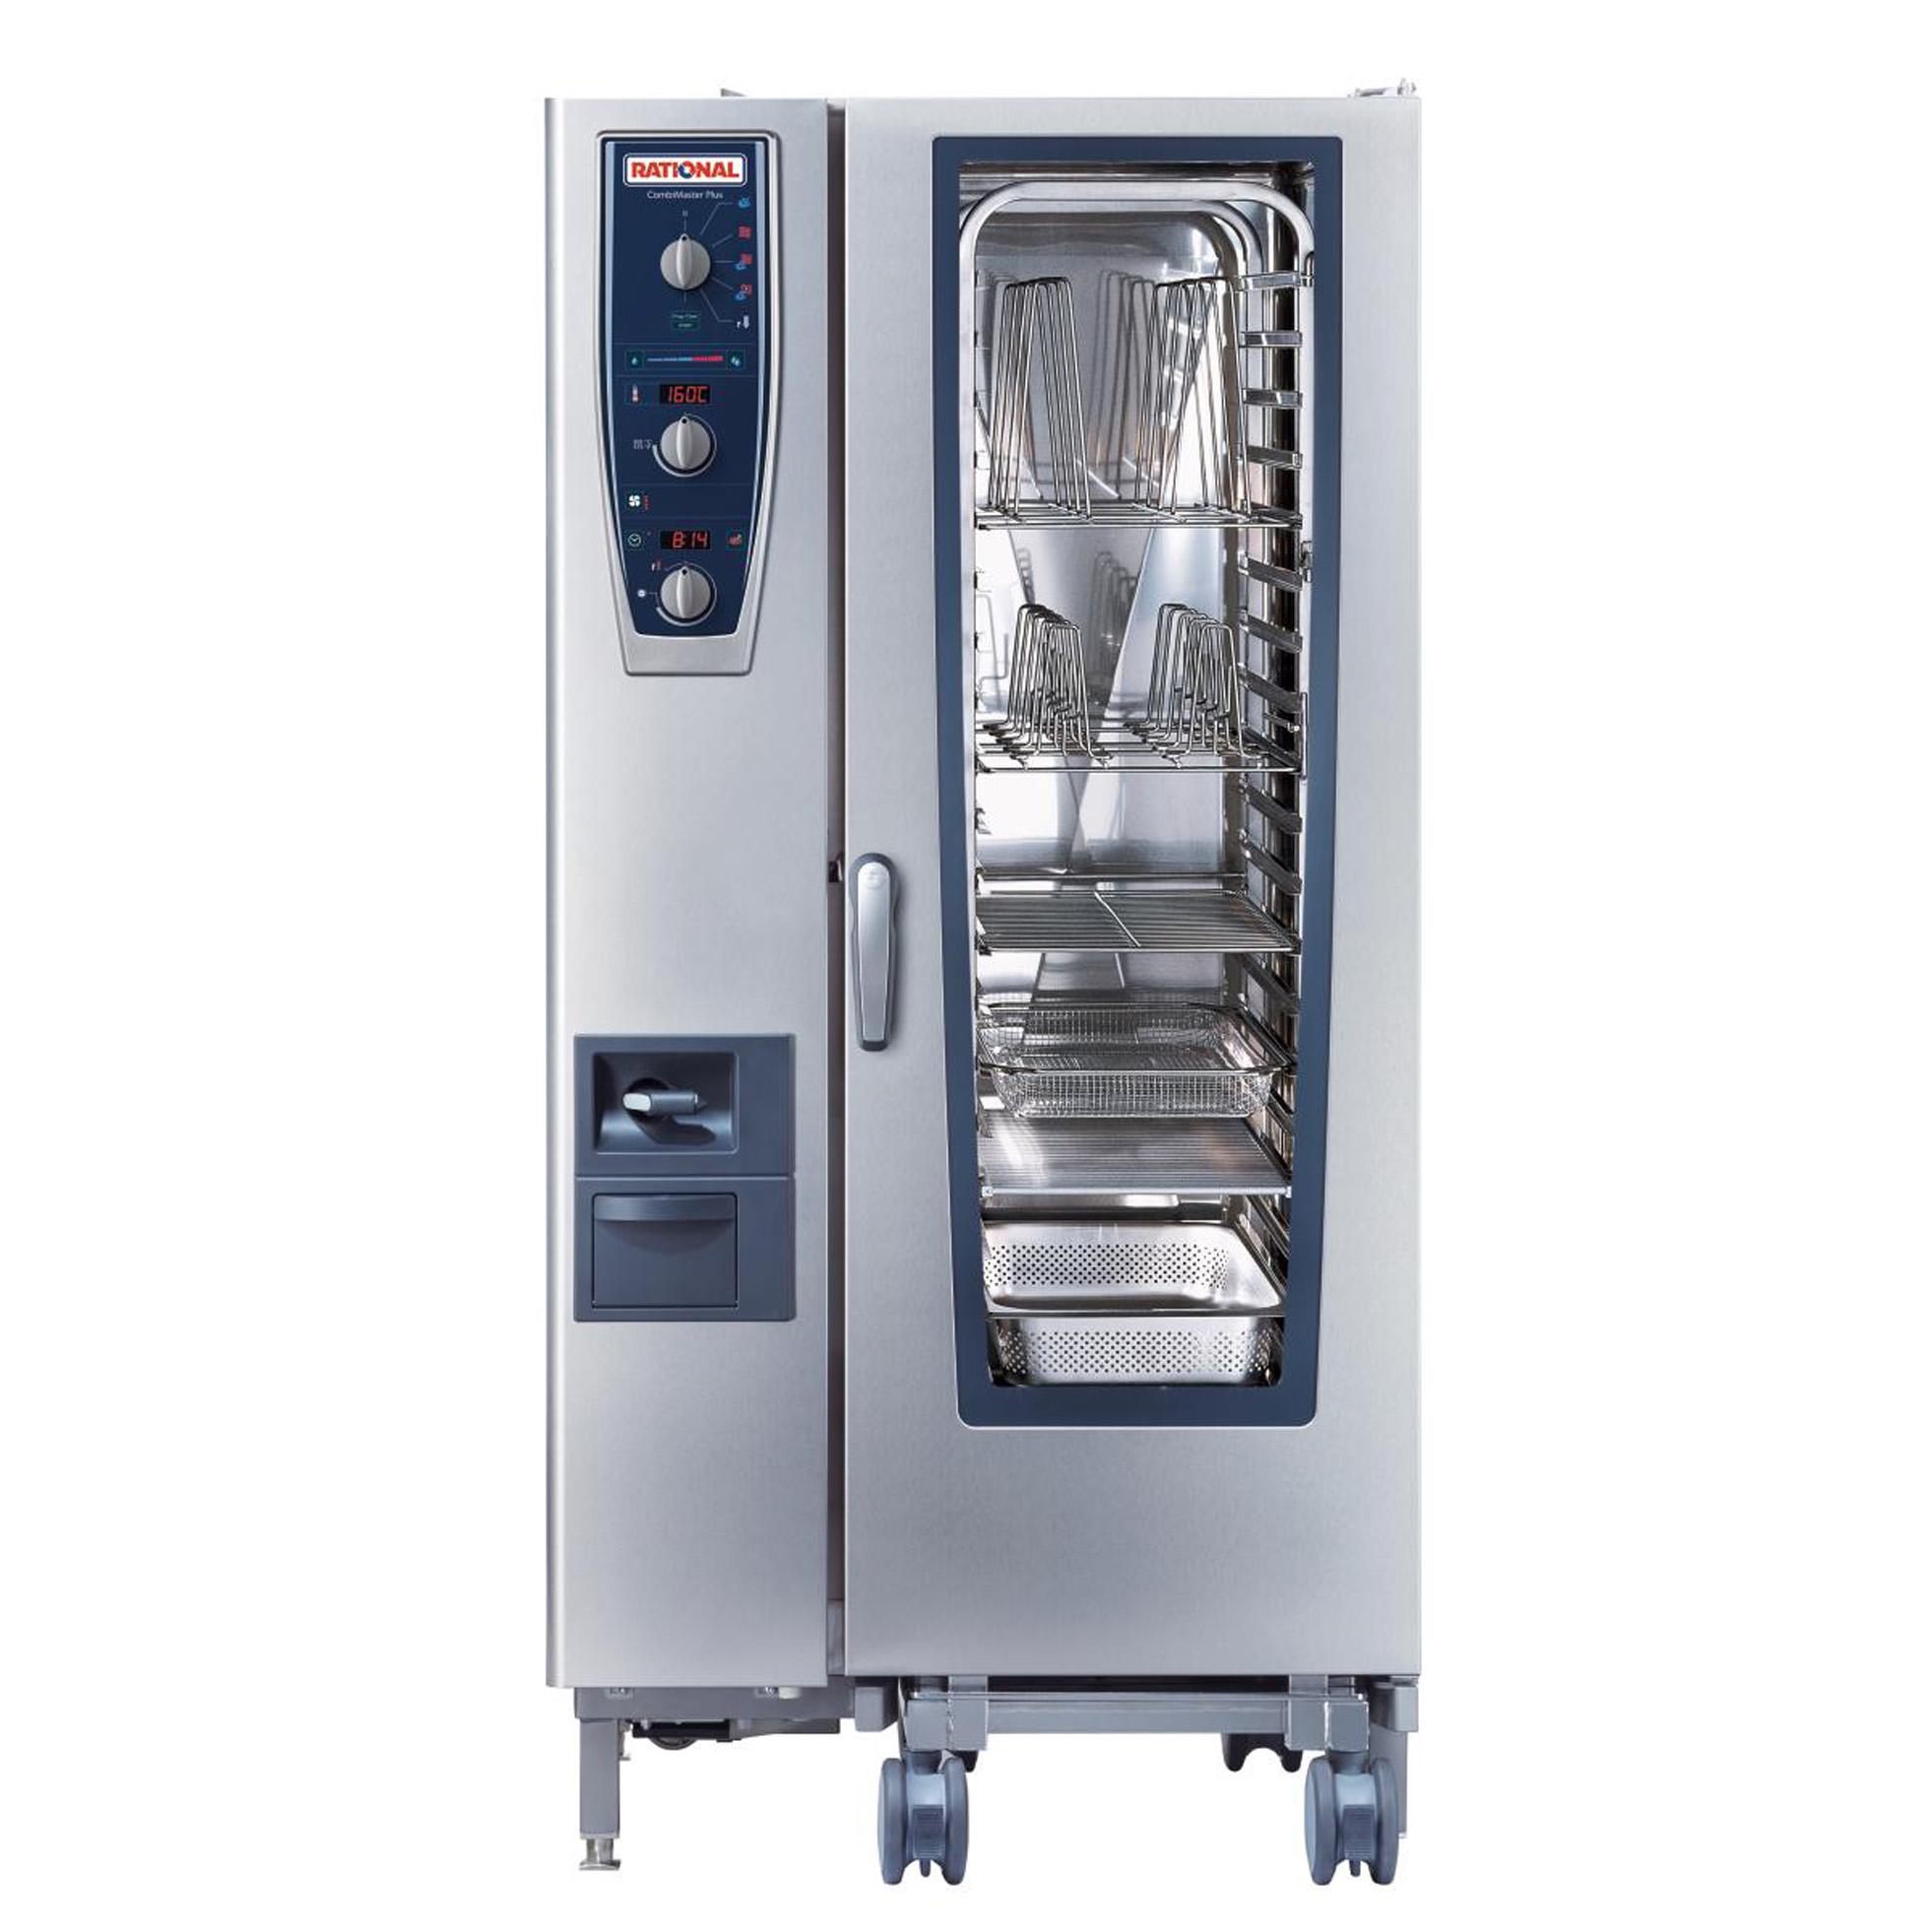 RATIONAL B219206.27E202 combi oven, gas